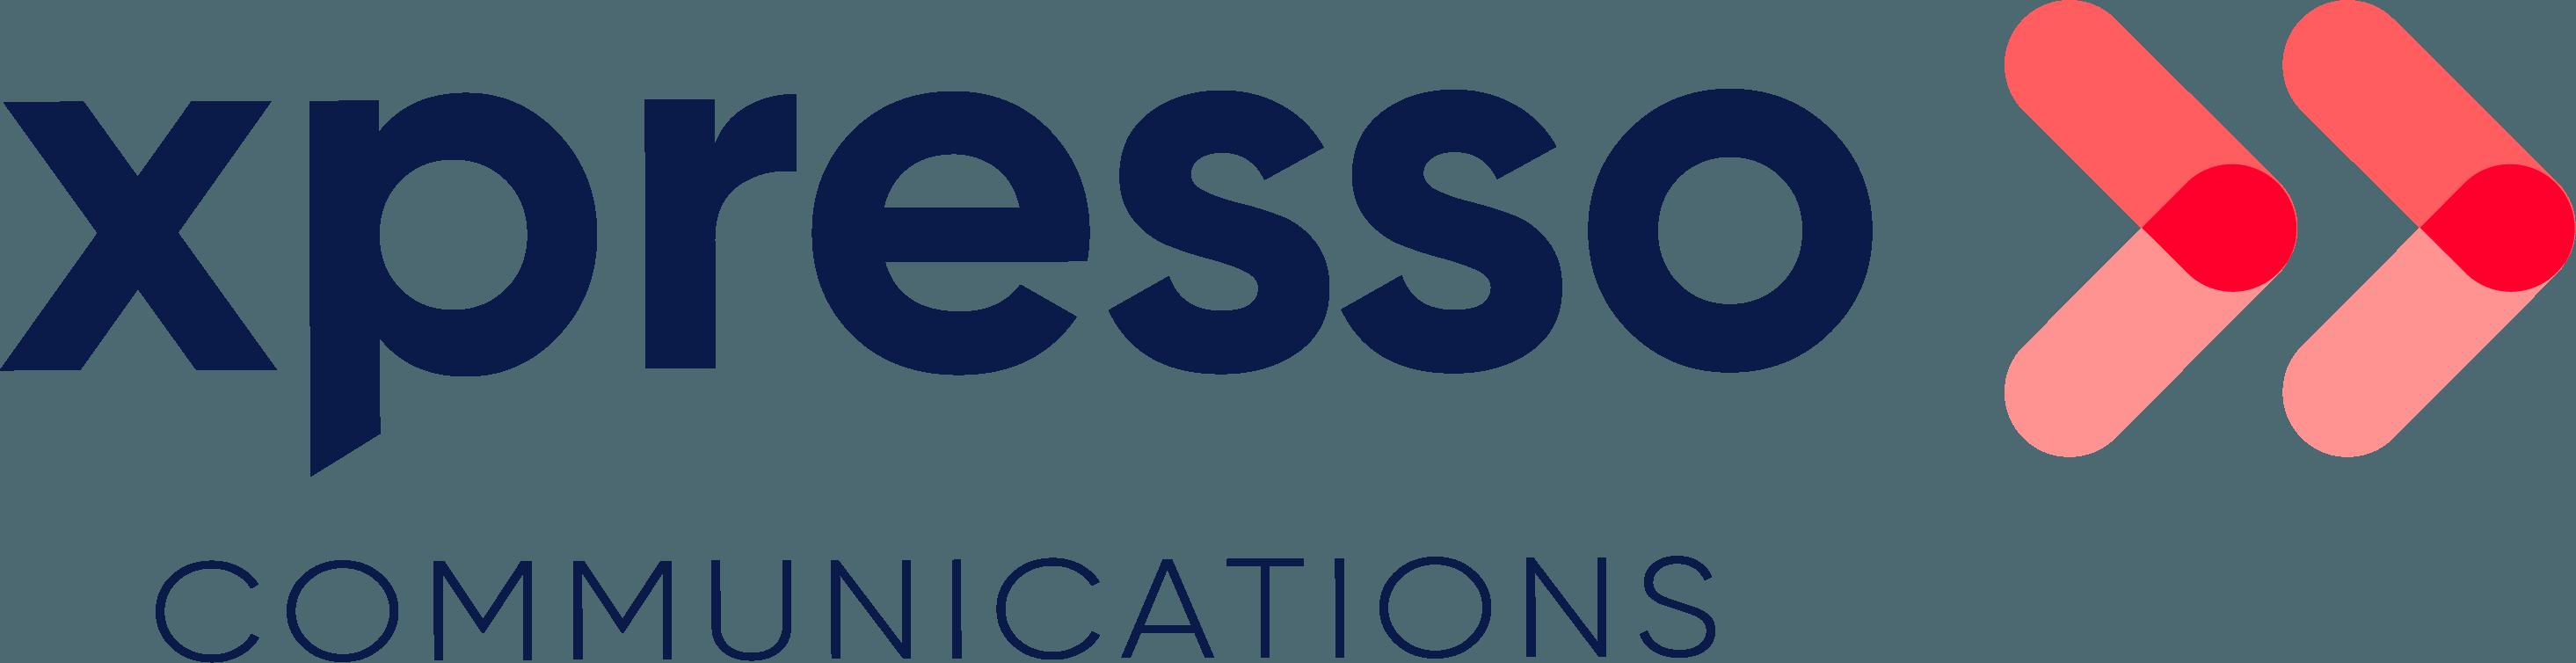 XPresso Communications: Technology Marketing & PR experts